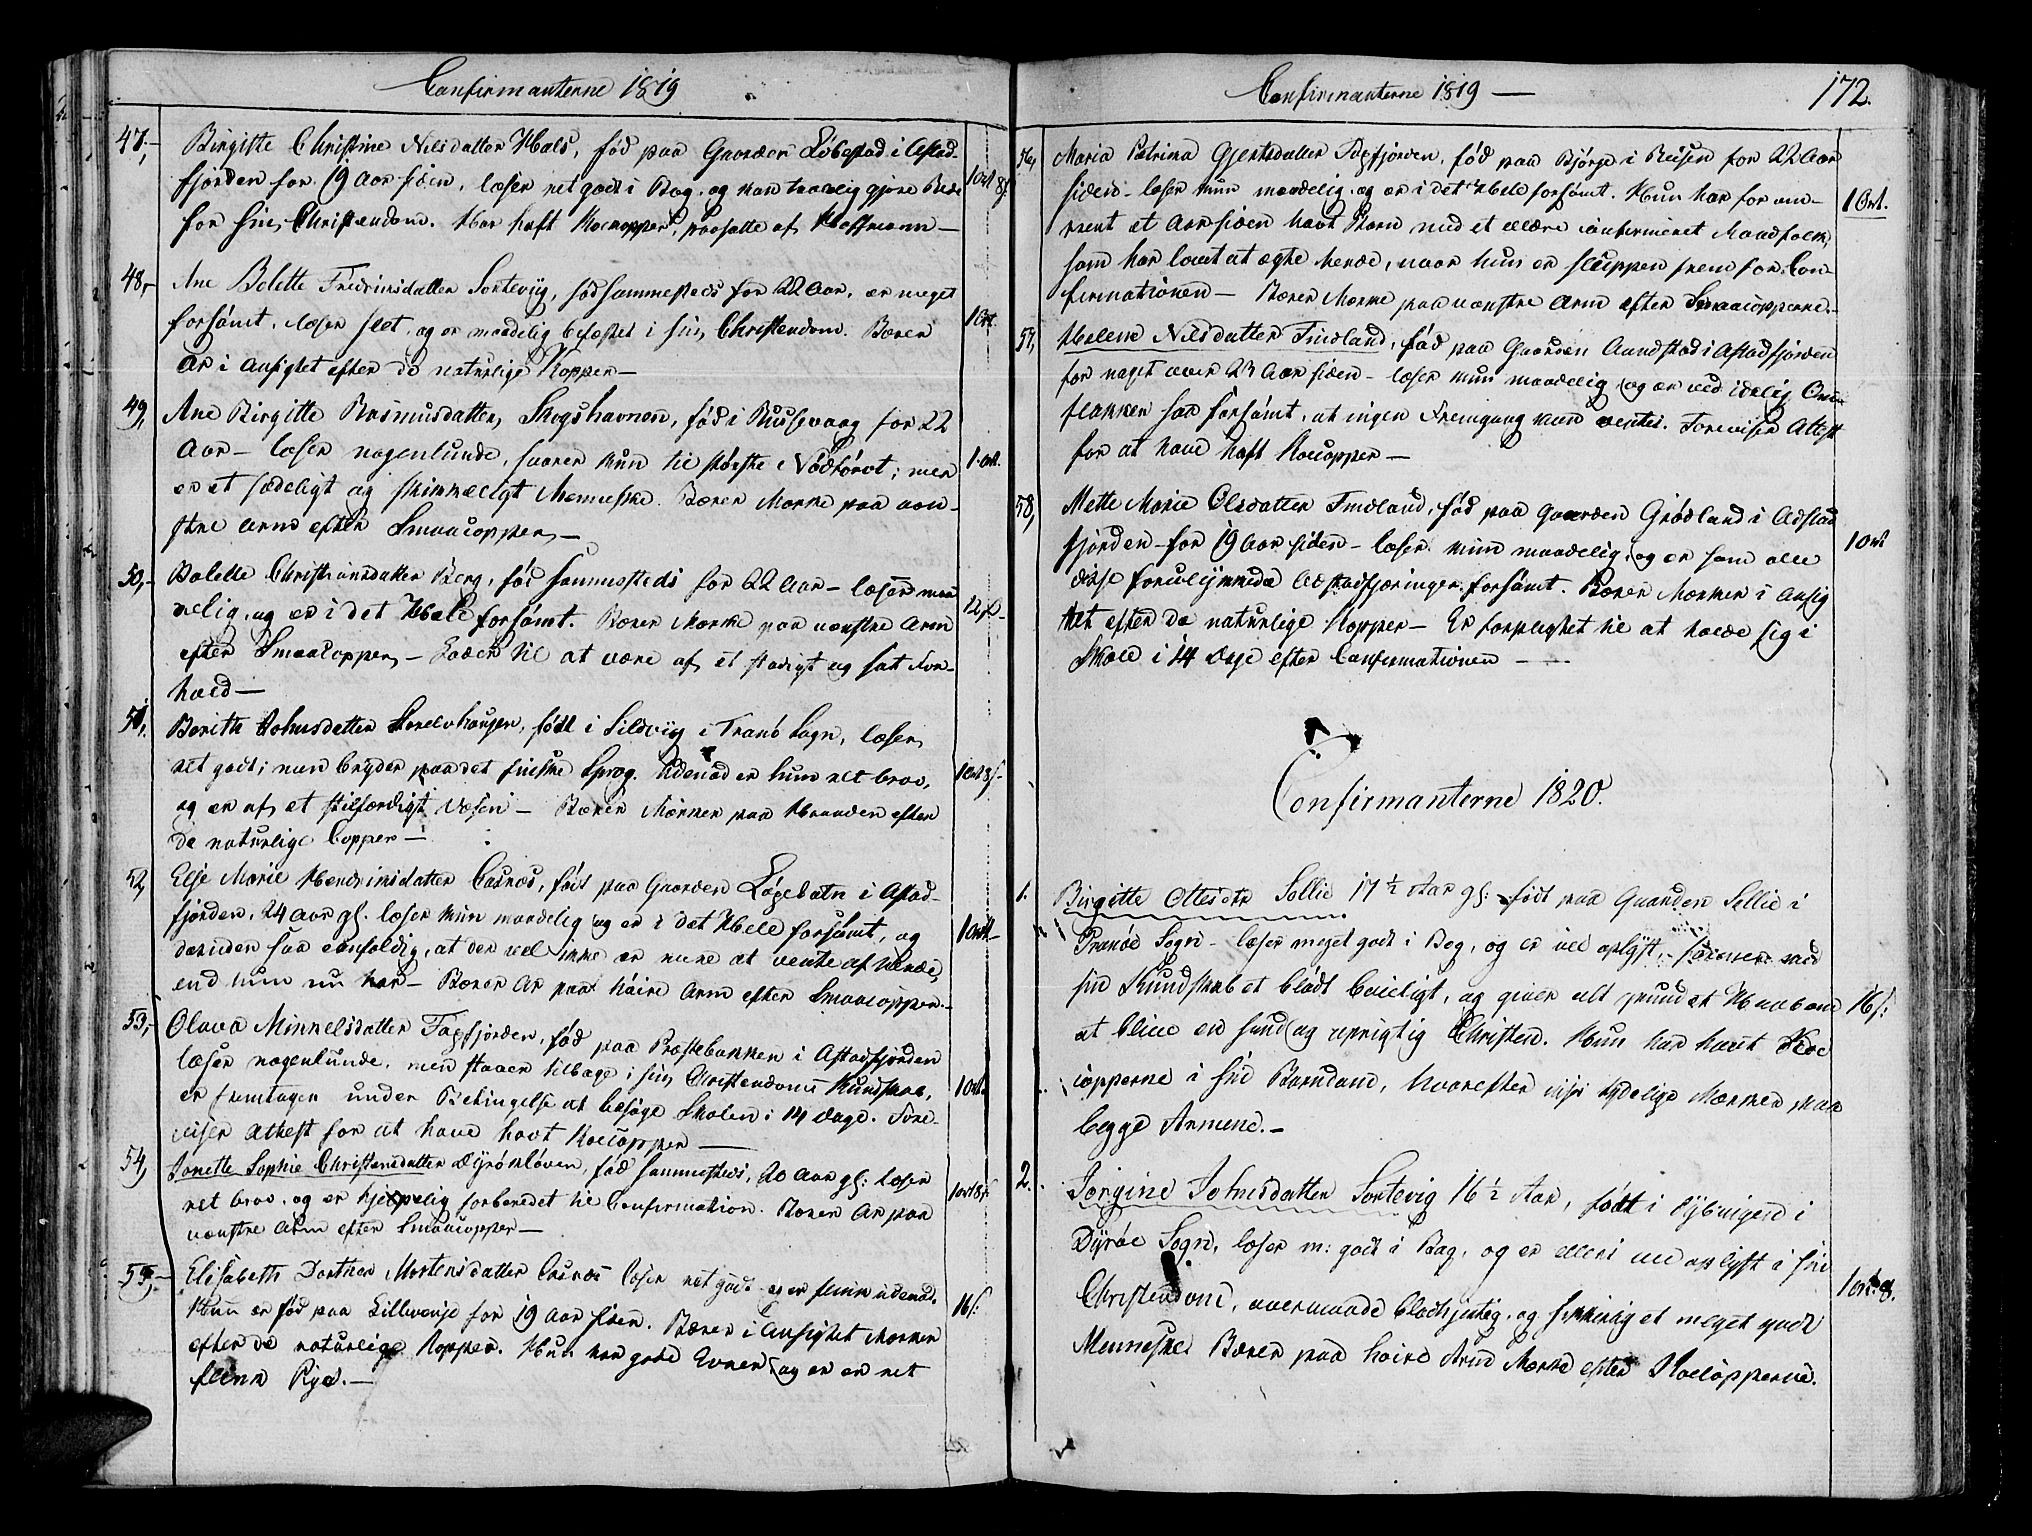 SATØ, Tranøy sokneprestkontor, I/Ia/Iaa/L0003kirke: Ministerialbok nr. 3, 1807-1820, s. 172